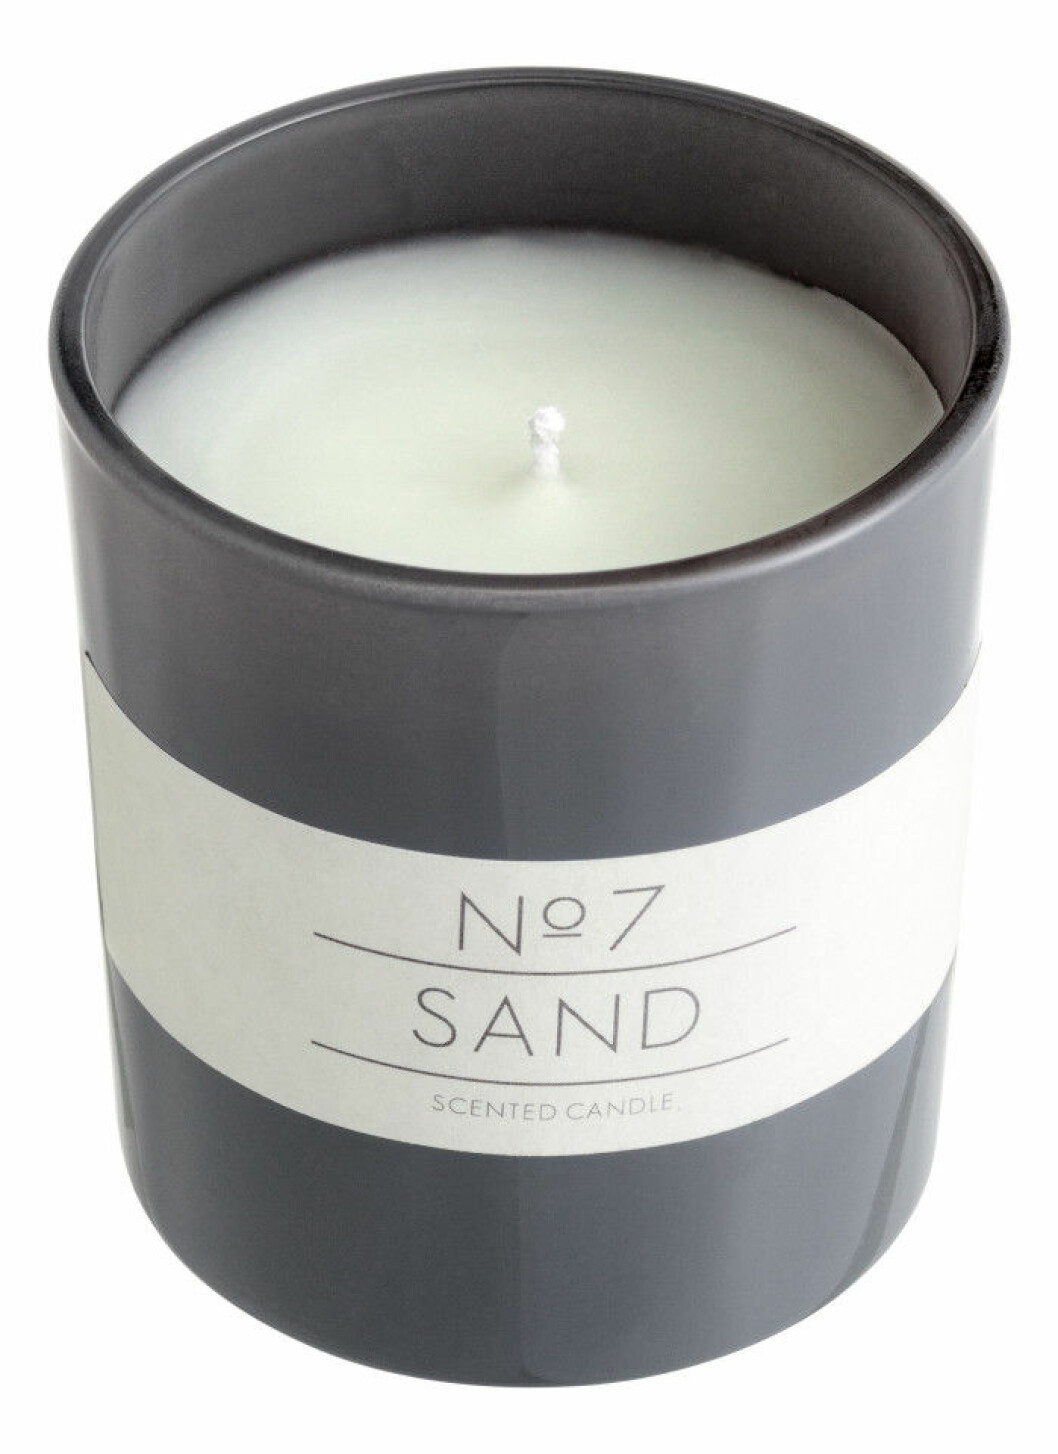 Doftljus Sand 49 90 kr hm